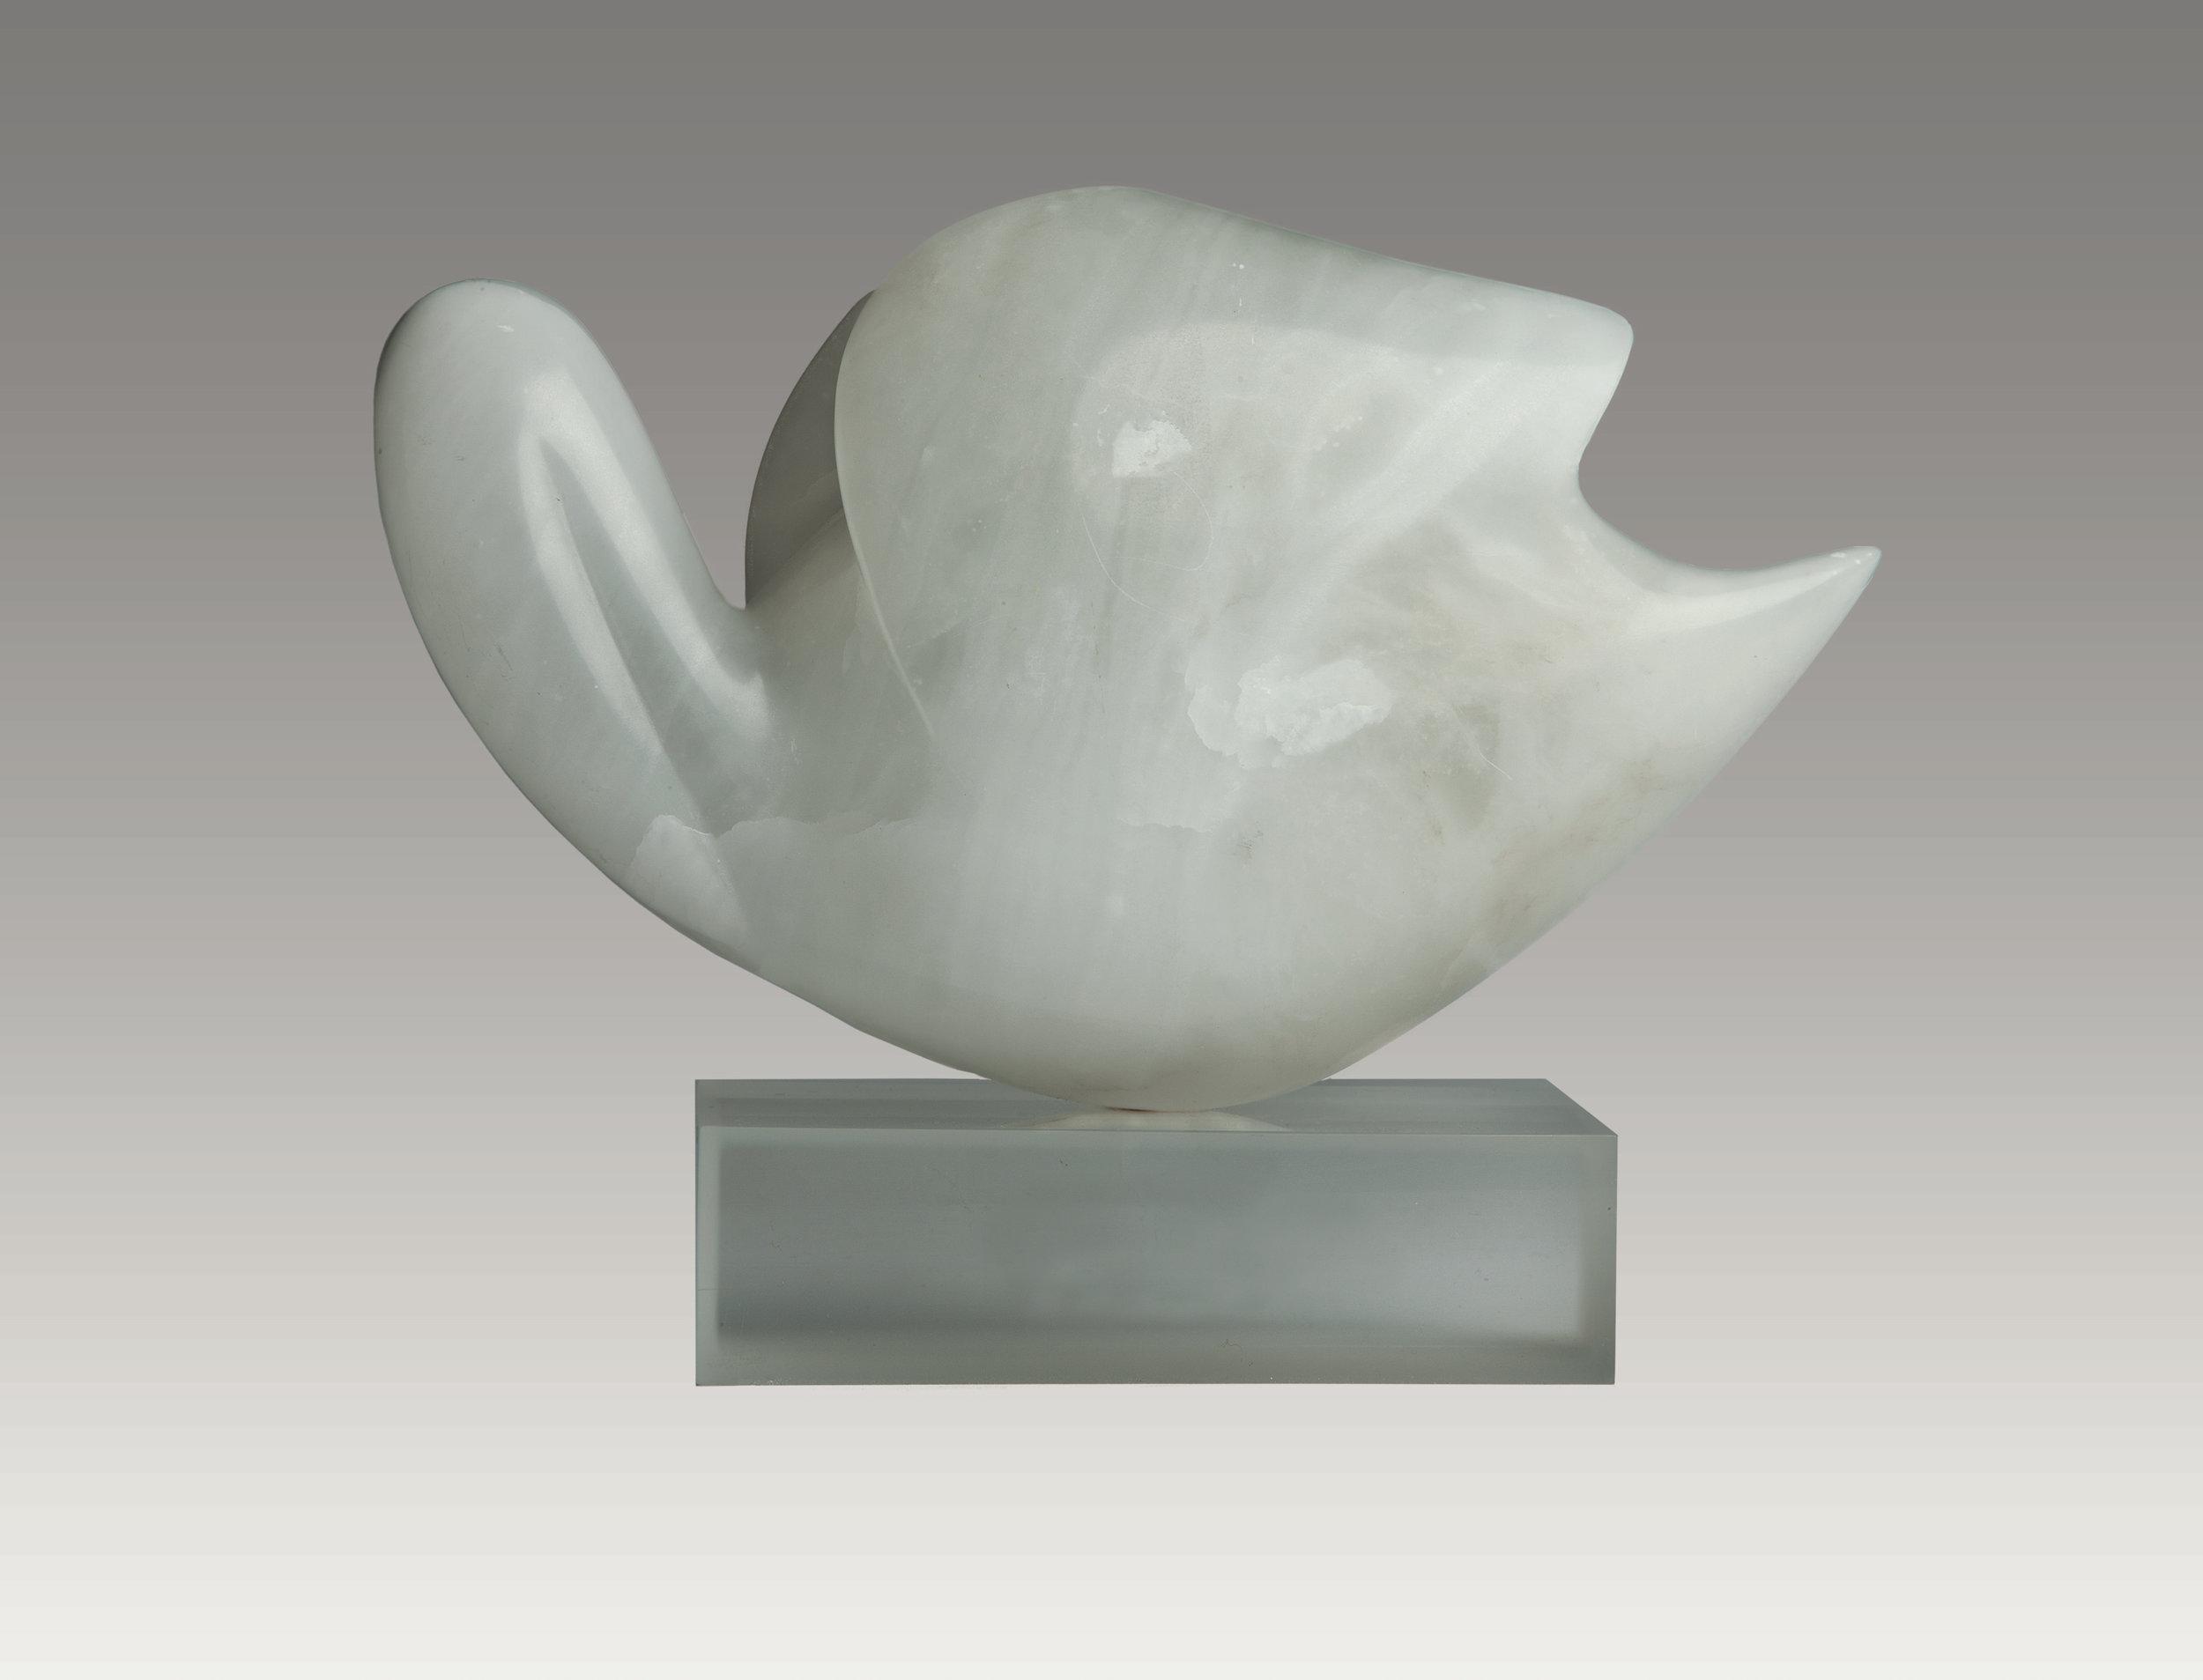 Sleeping Swan (alabaster) 7 x 12 x 5 inches